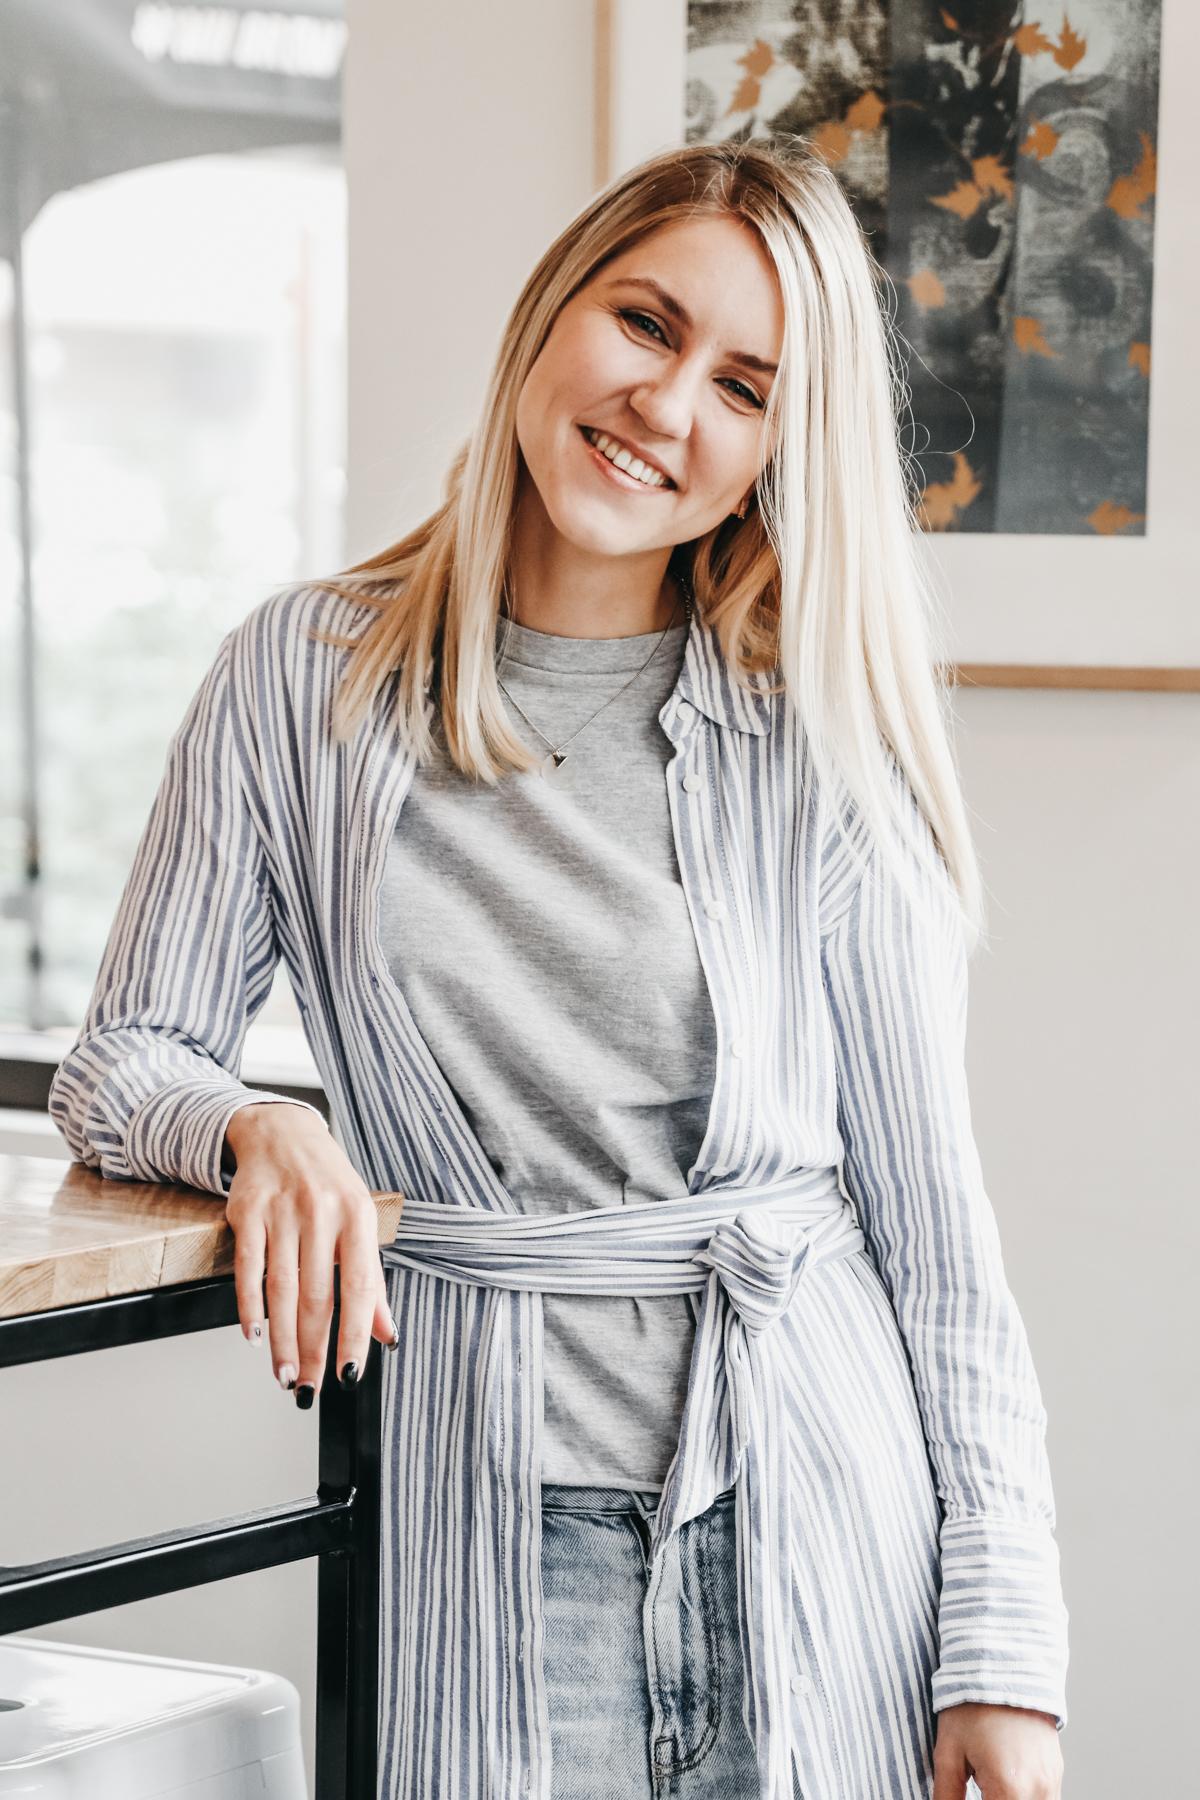 Anastasia Giancola INSPIRE YEG | Photo by Nicole Constante | Edmonton business startup_-9.jpg